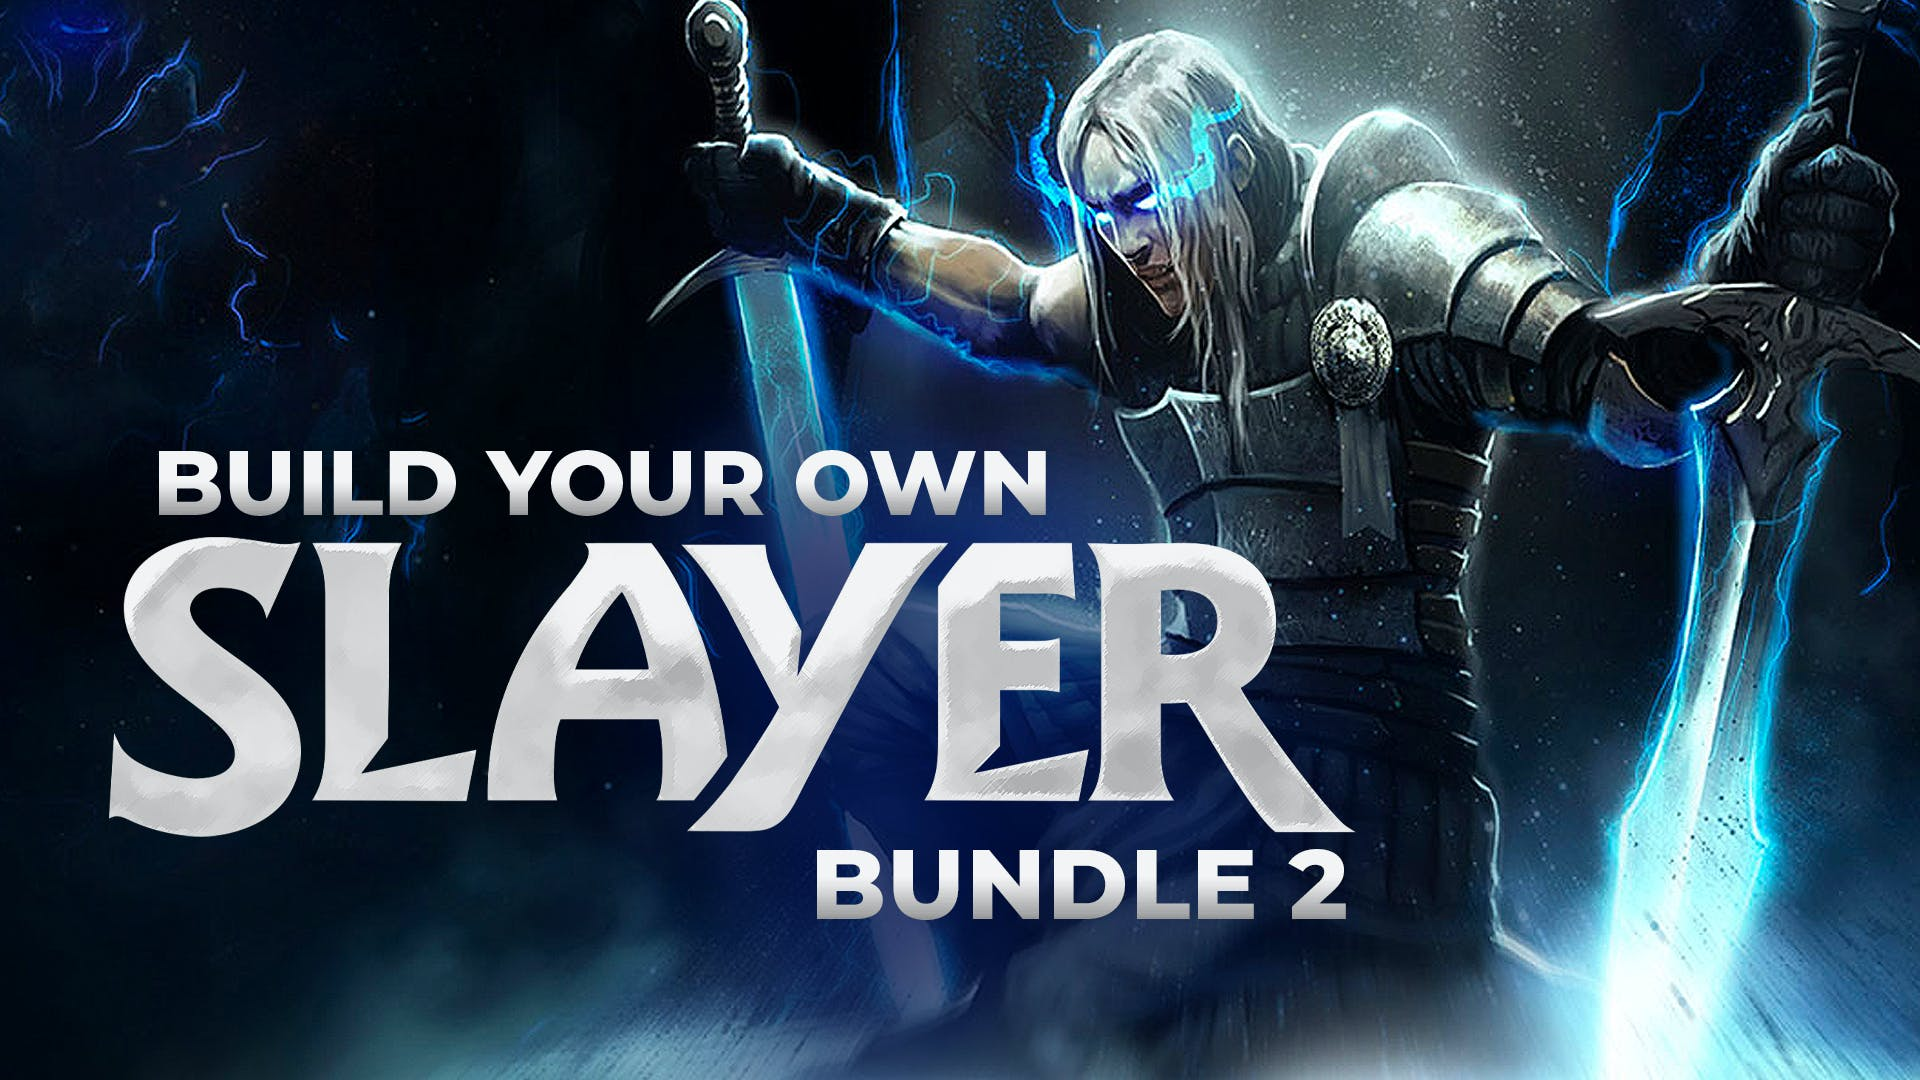 Build your own Slayer Bundle 2